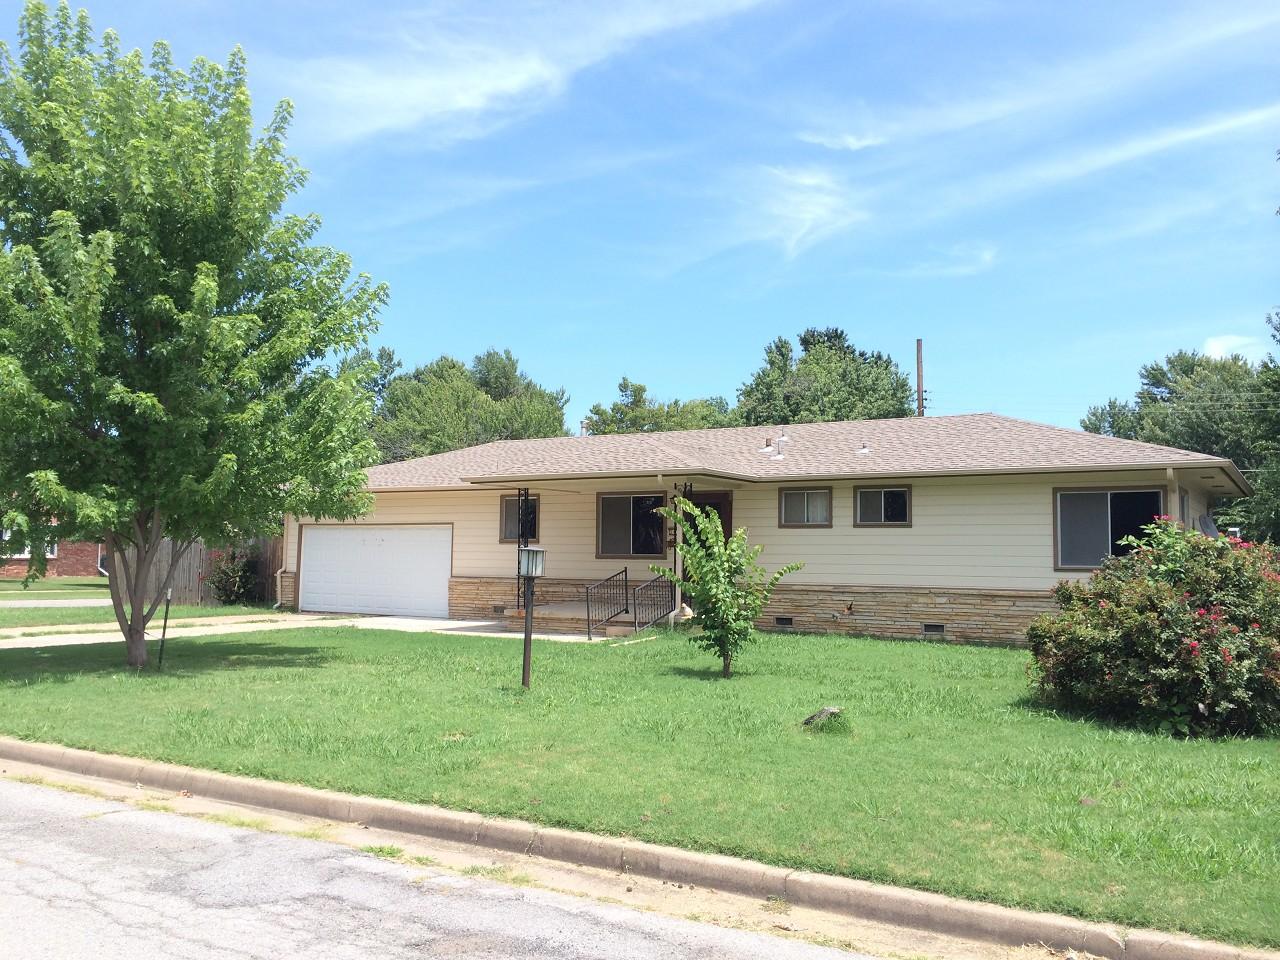 Real Estate for Sale, ListingId: 29337829, Broken Arrow,OK74012